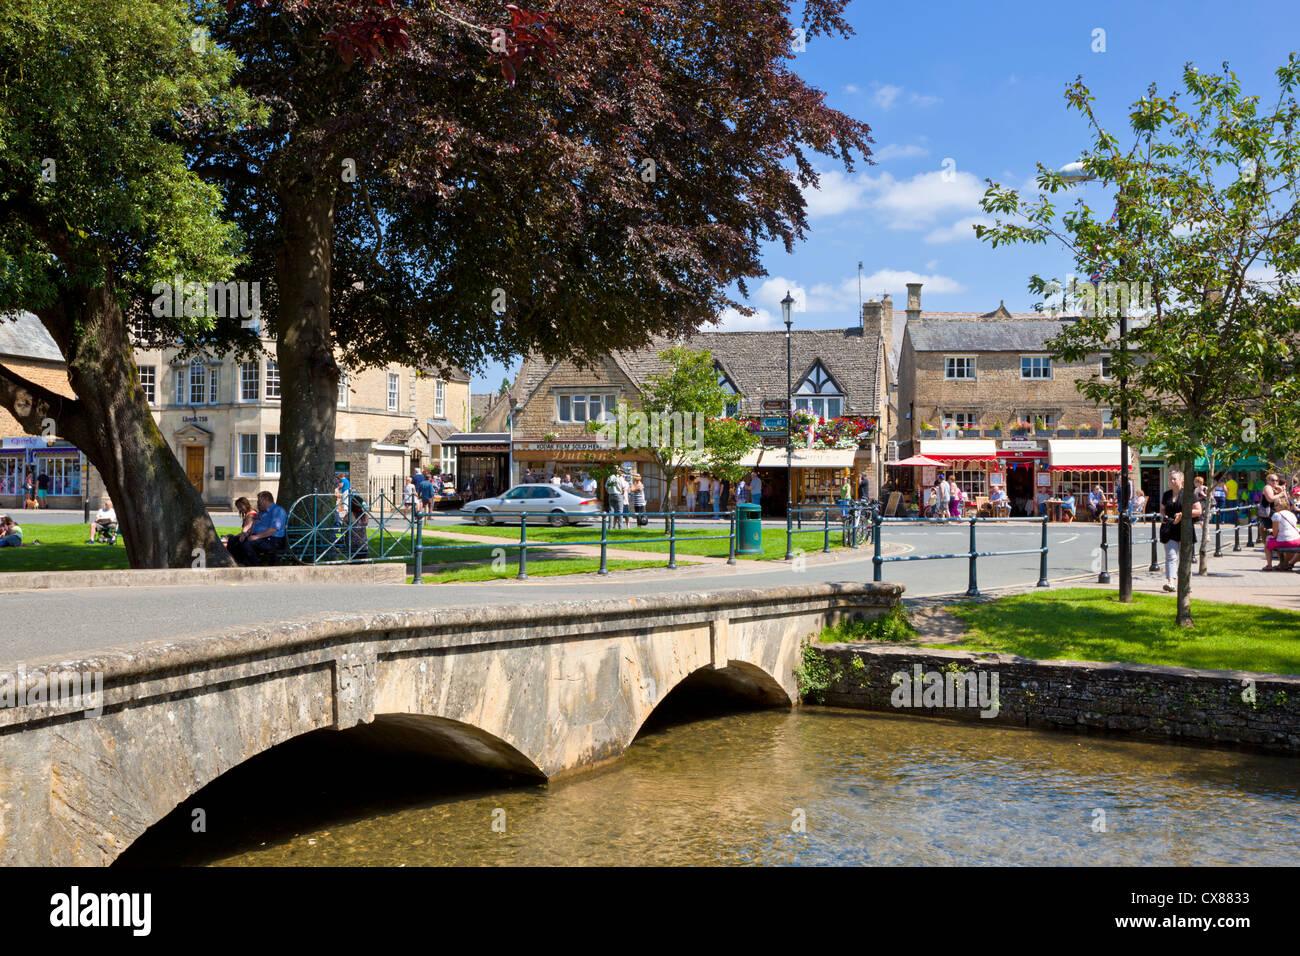 En la aldea de agua Bourton centro Cotswolds Gloucestershire Inglaterra GB Europa UE Imagen De Stock